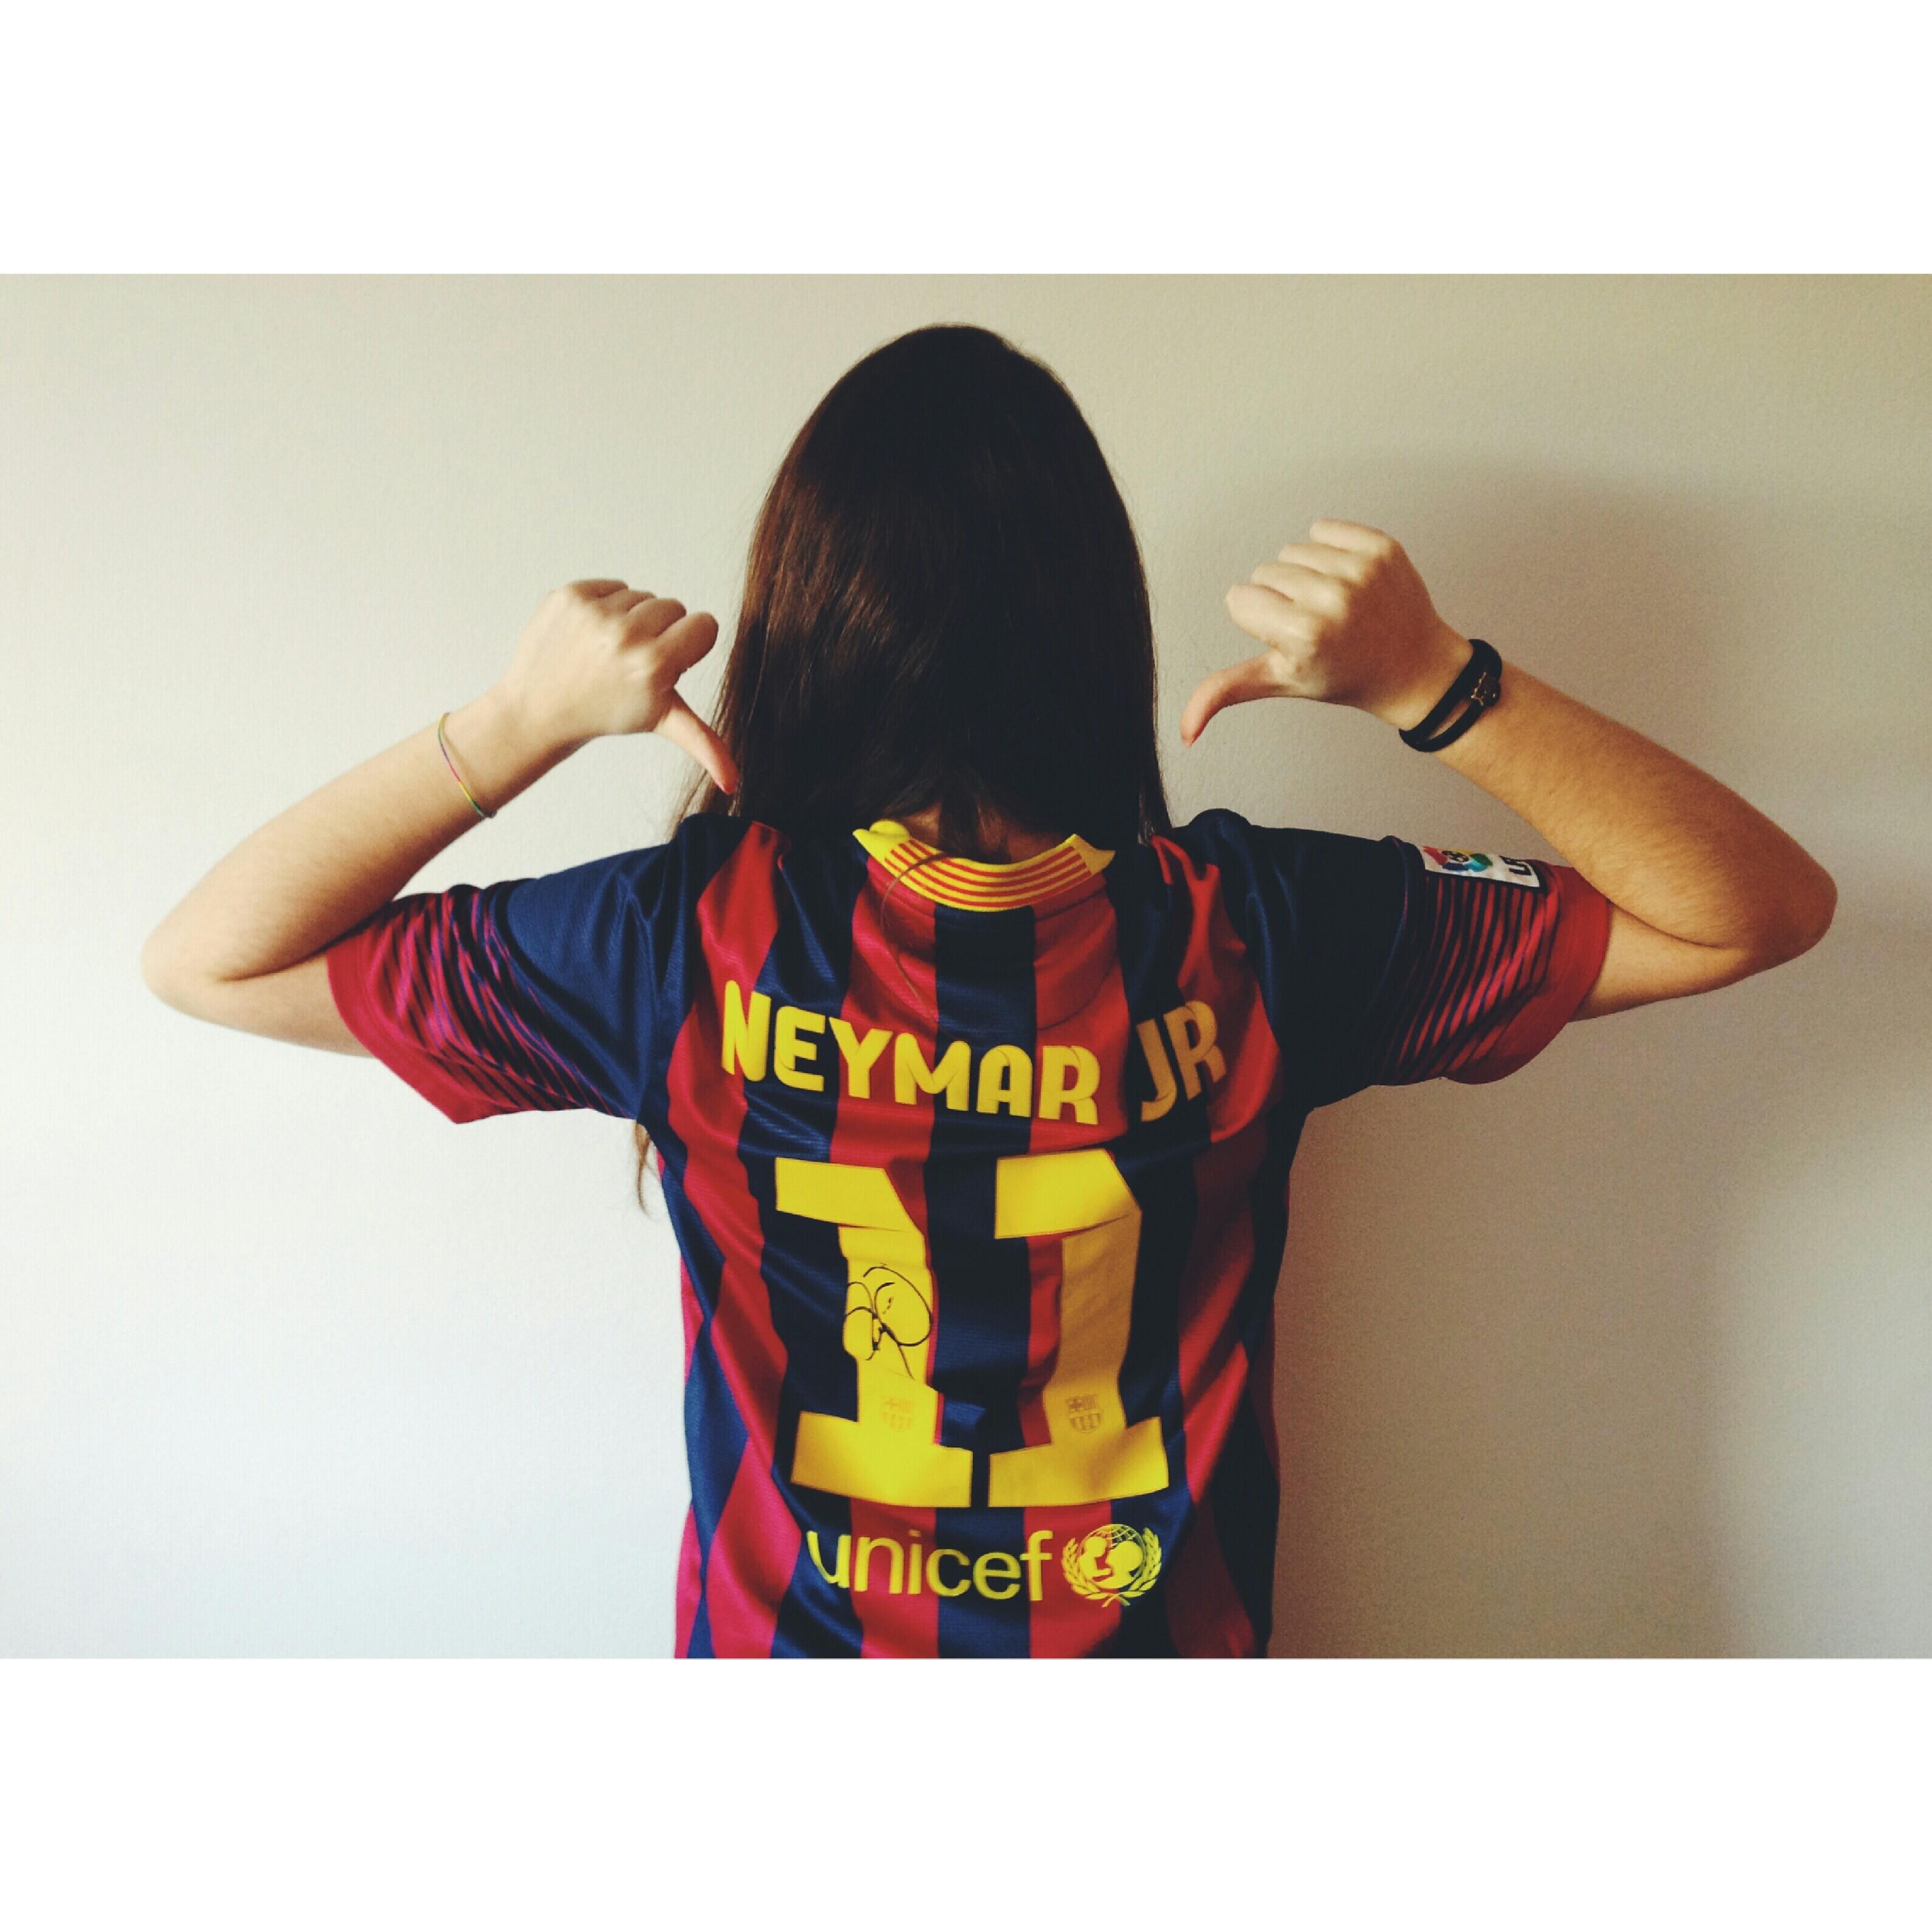 Football girls tumblr